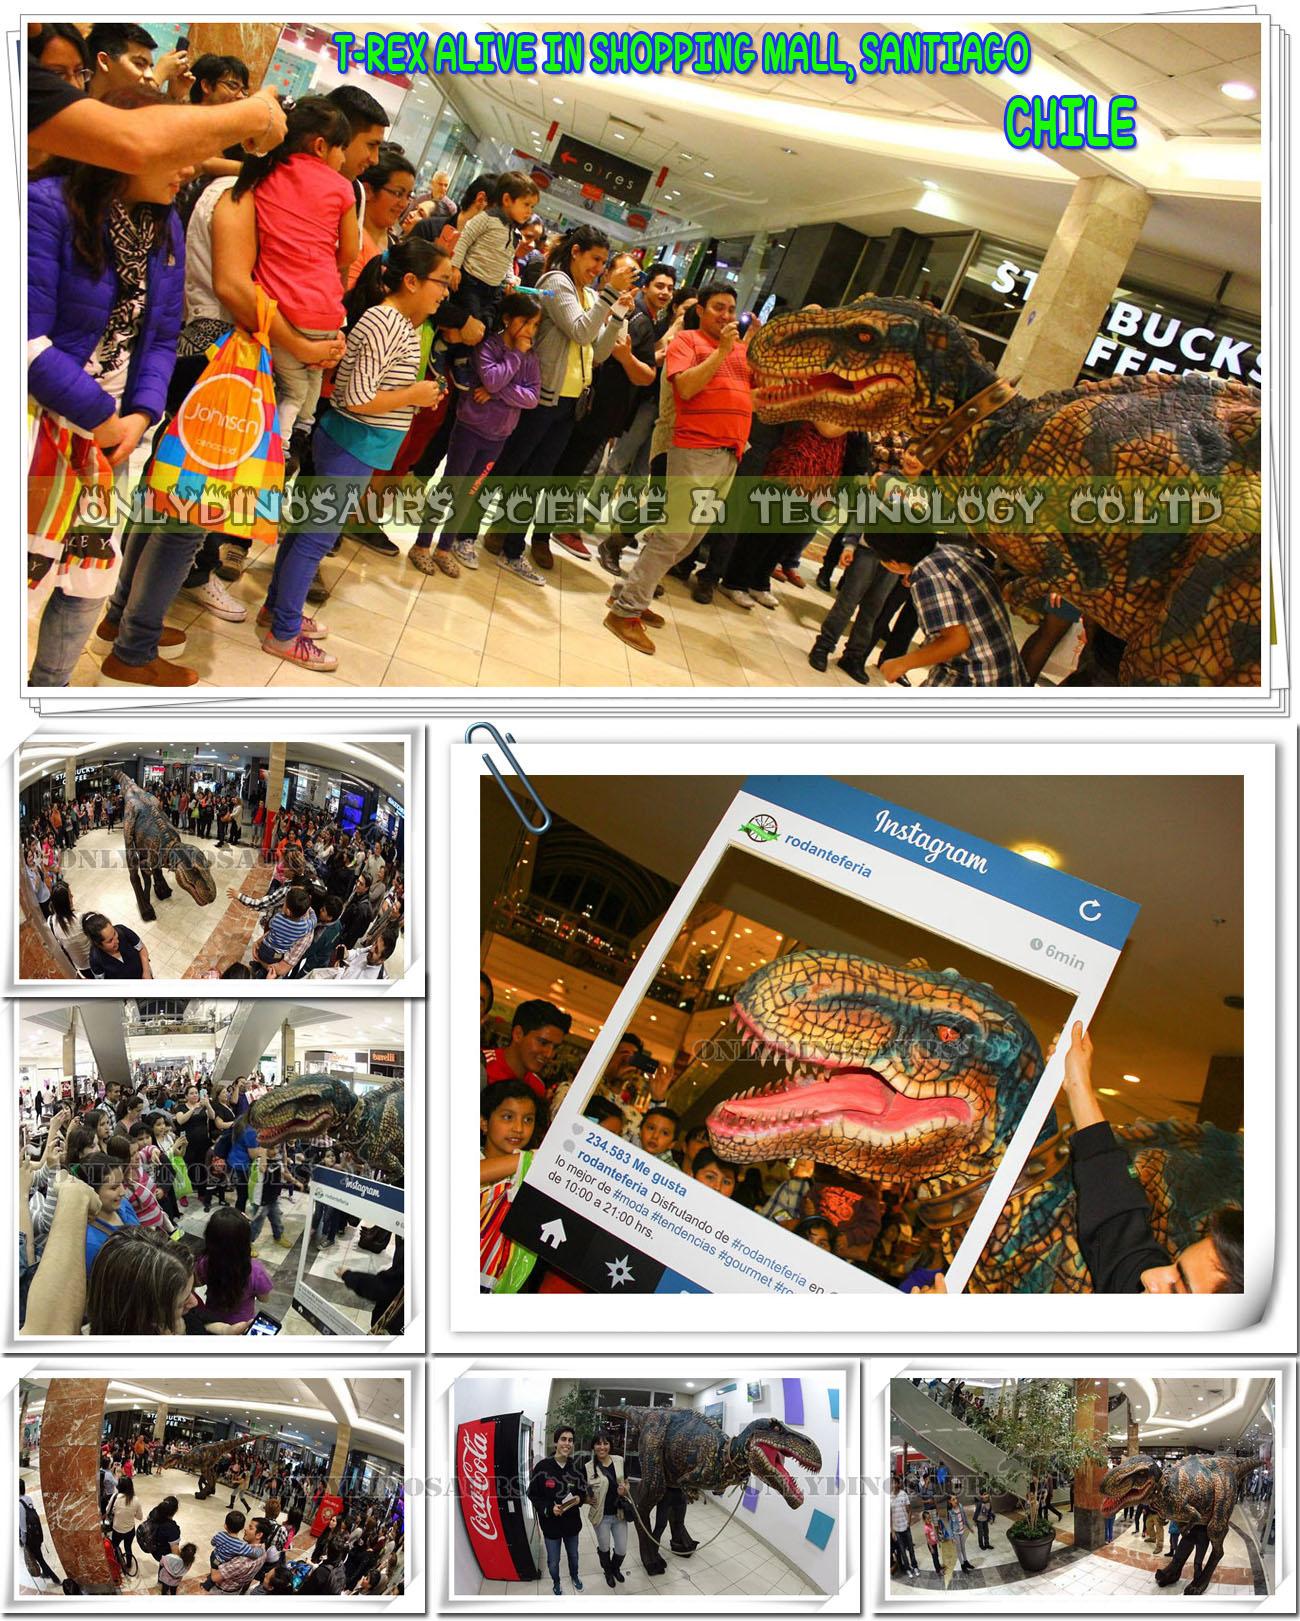 T-Rex Attacks Shopping Mall